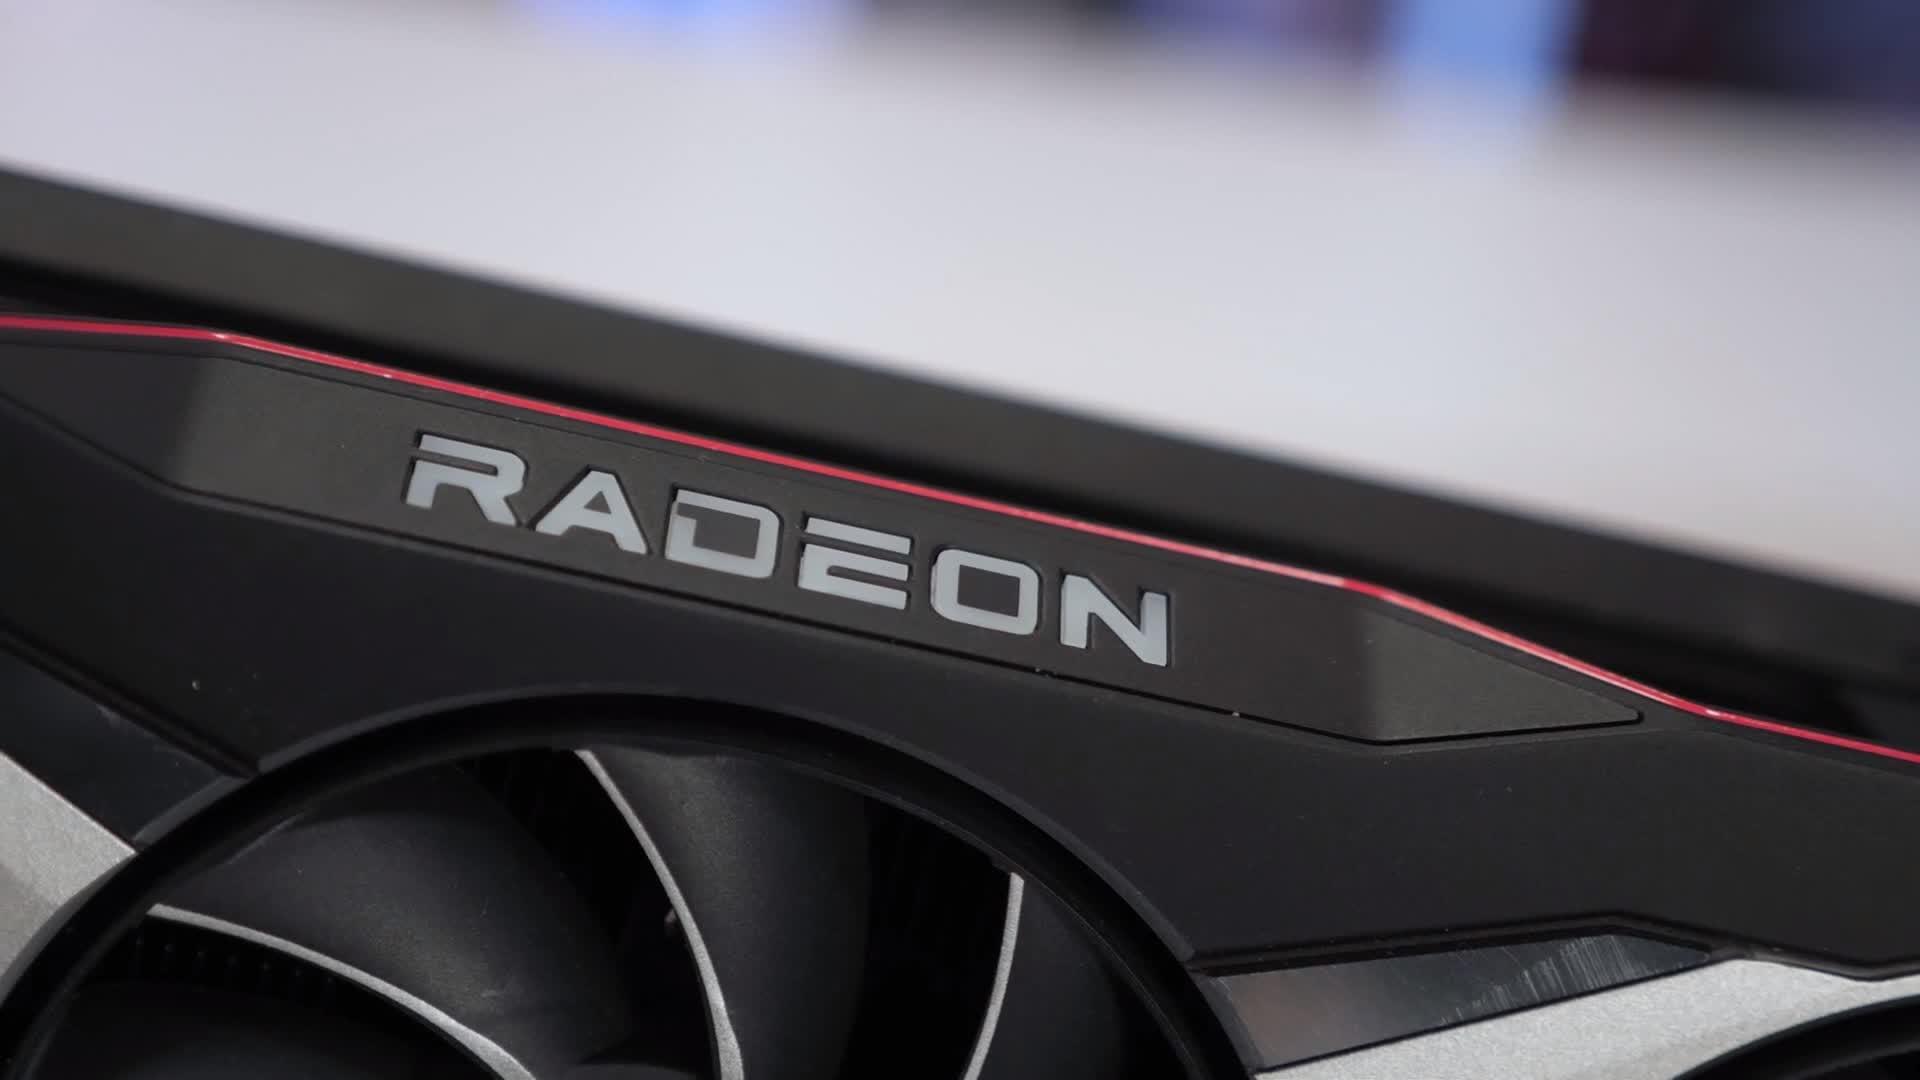 1633605743 354 GeForce RTX 3080 Ti contre Radeon RX 6800 XT